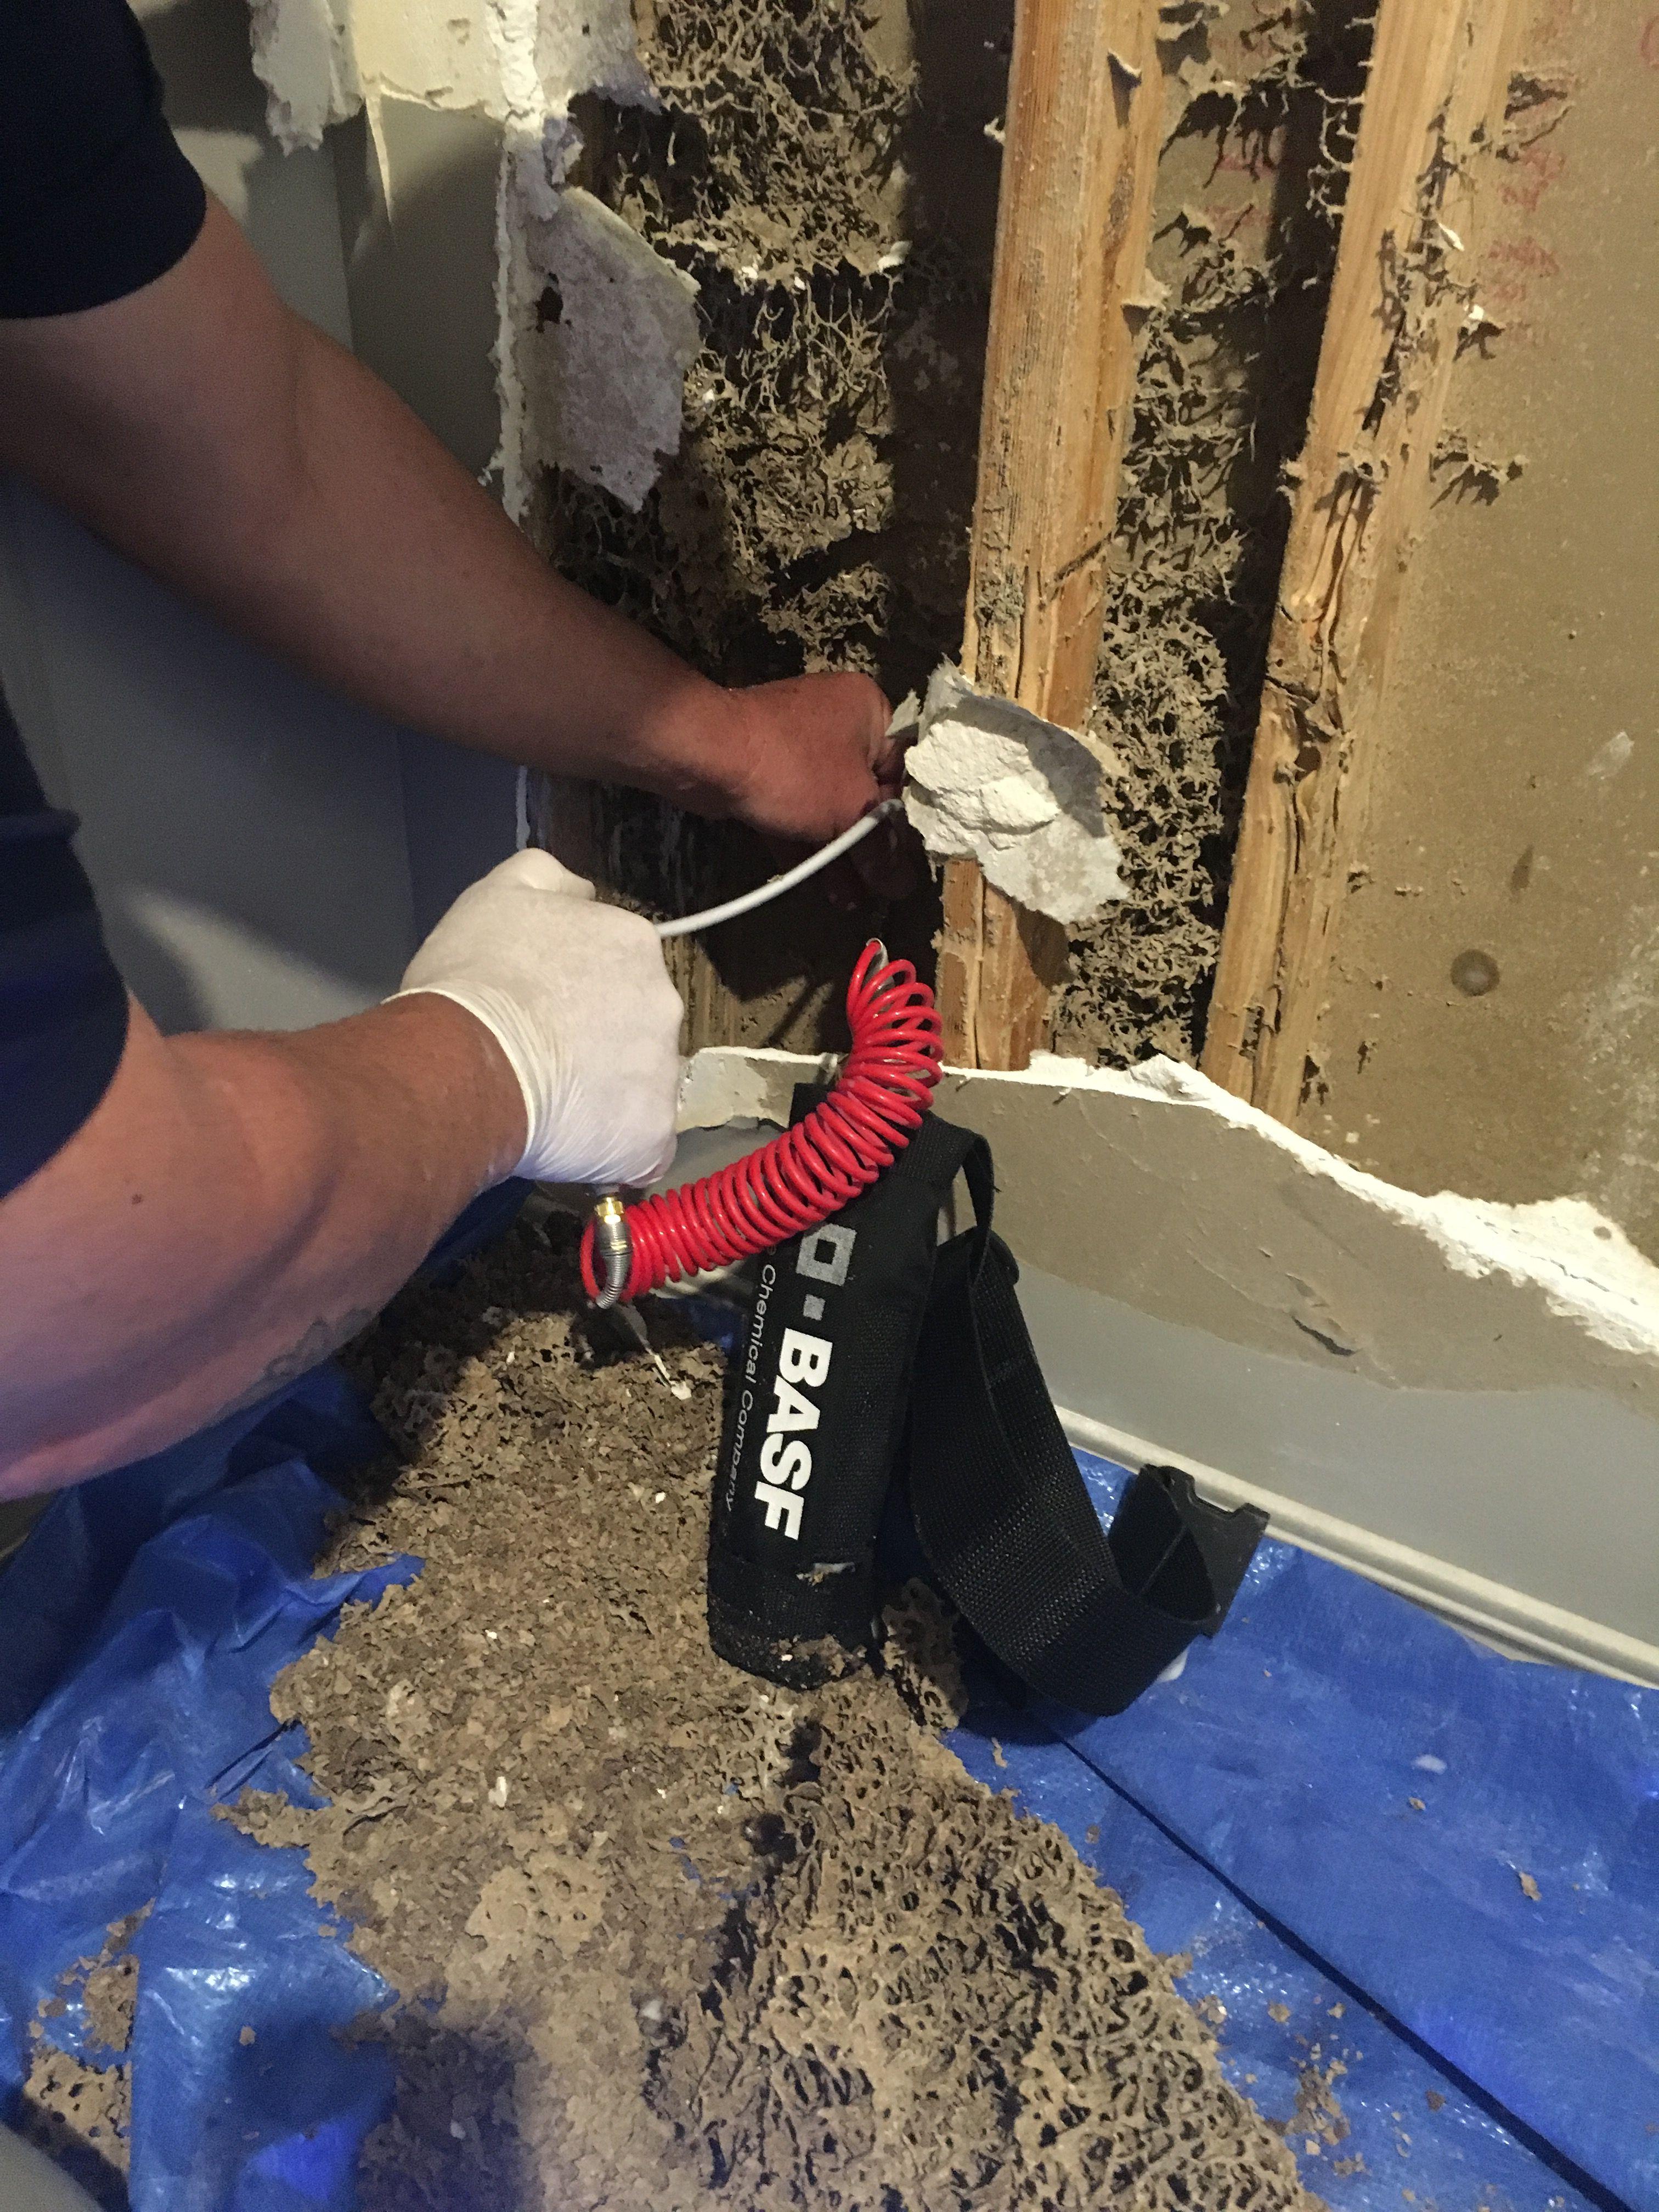 Gallery Bob Gunn Termite Solutions In Brisbane Qld Termites Termite Damage Bob